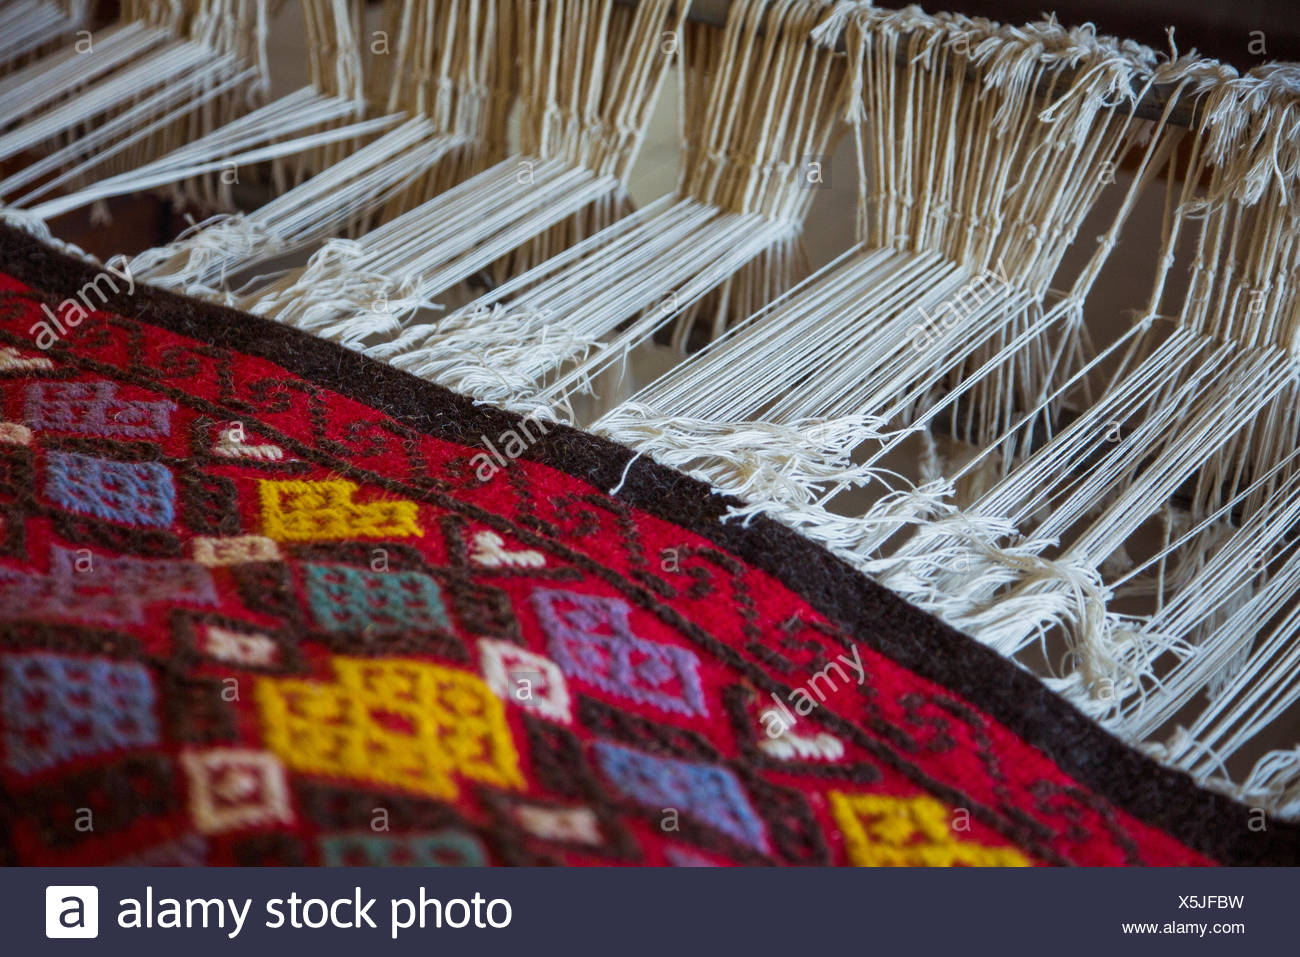 High angle view of fabric handloom weaving machine Stock